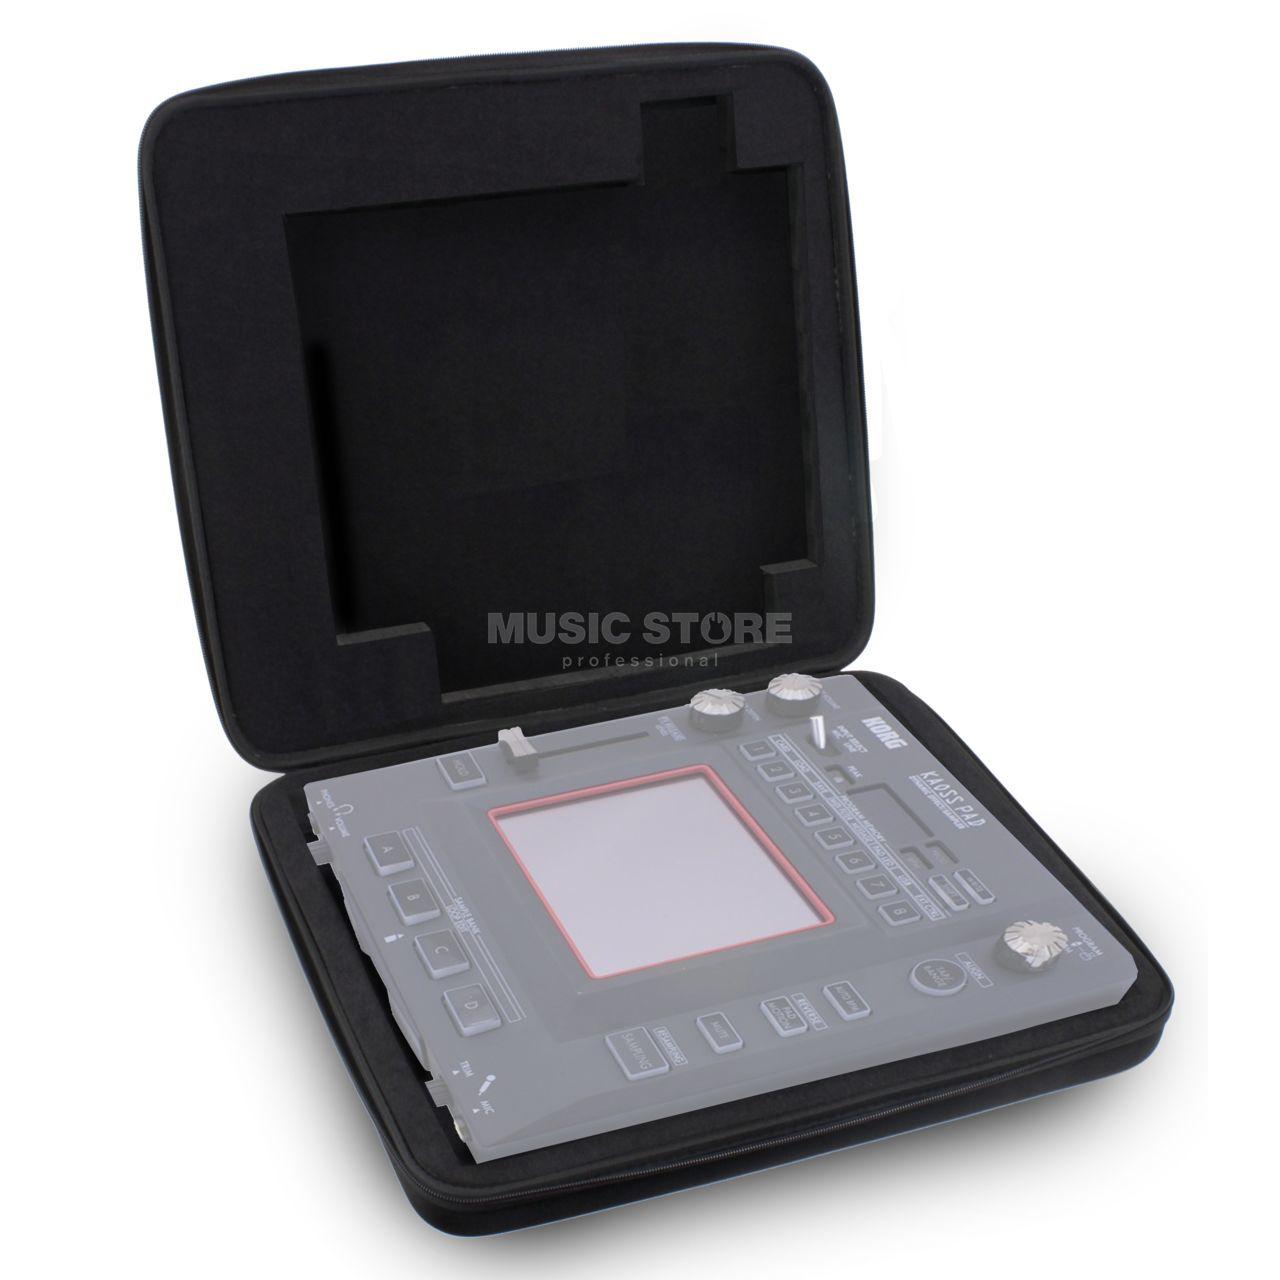 udg creator korg kaoss pad kp3 kaossilator pro hardcase black u8433bl music store. Black Bedroom Furniture Sets. Home Design Ideas